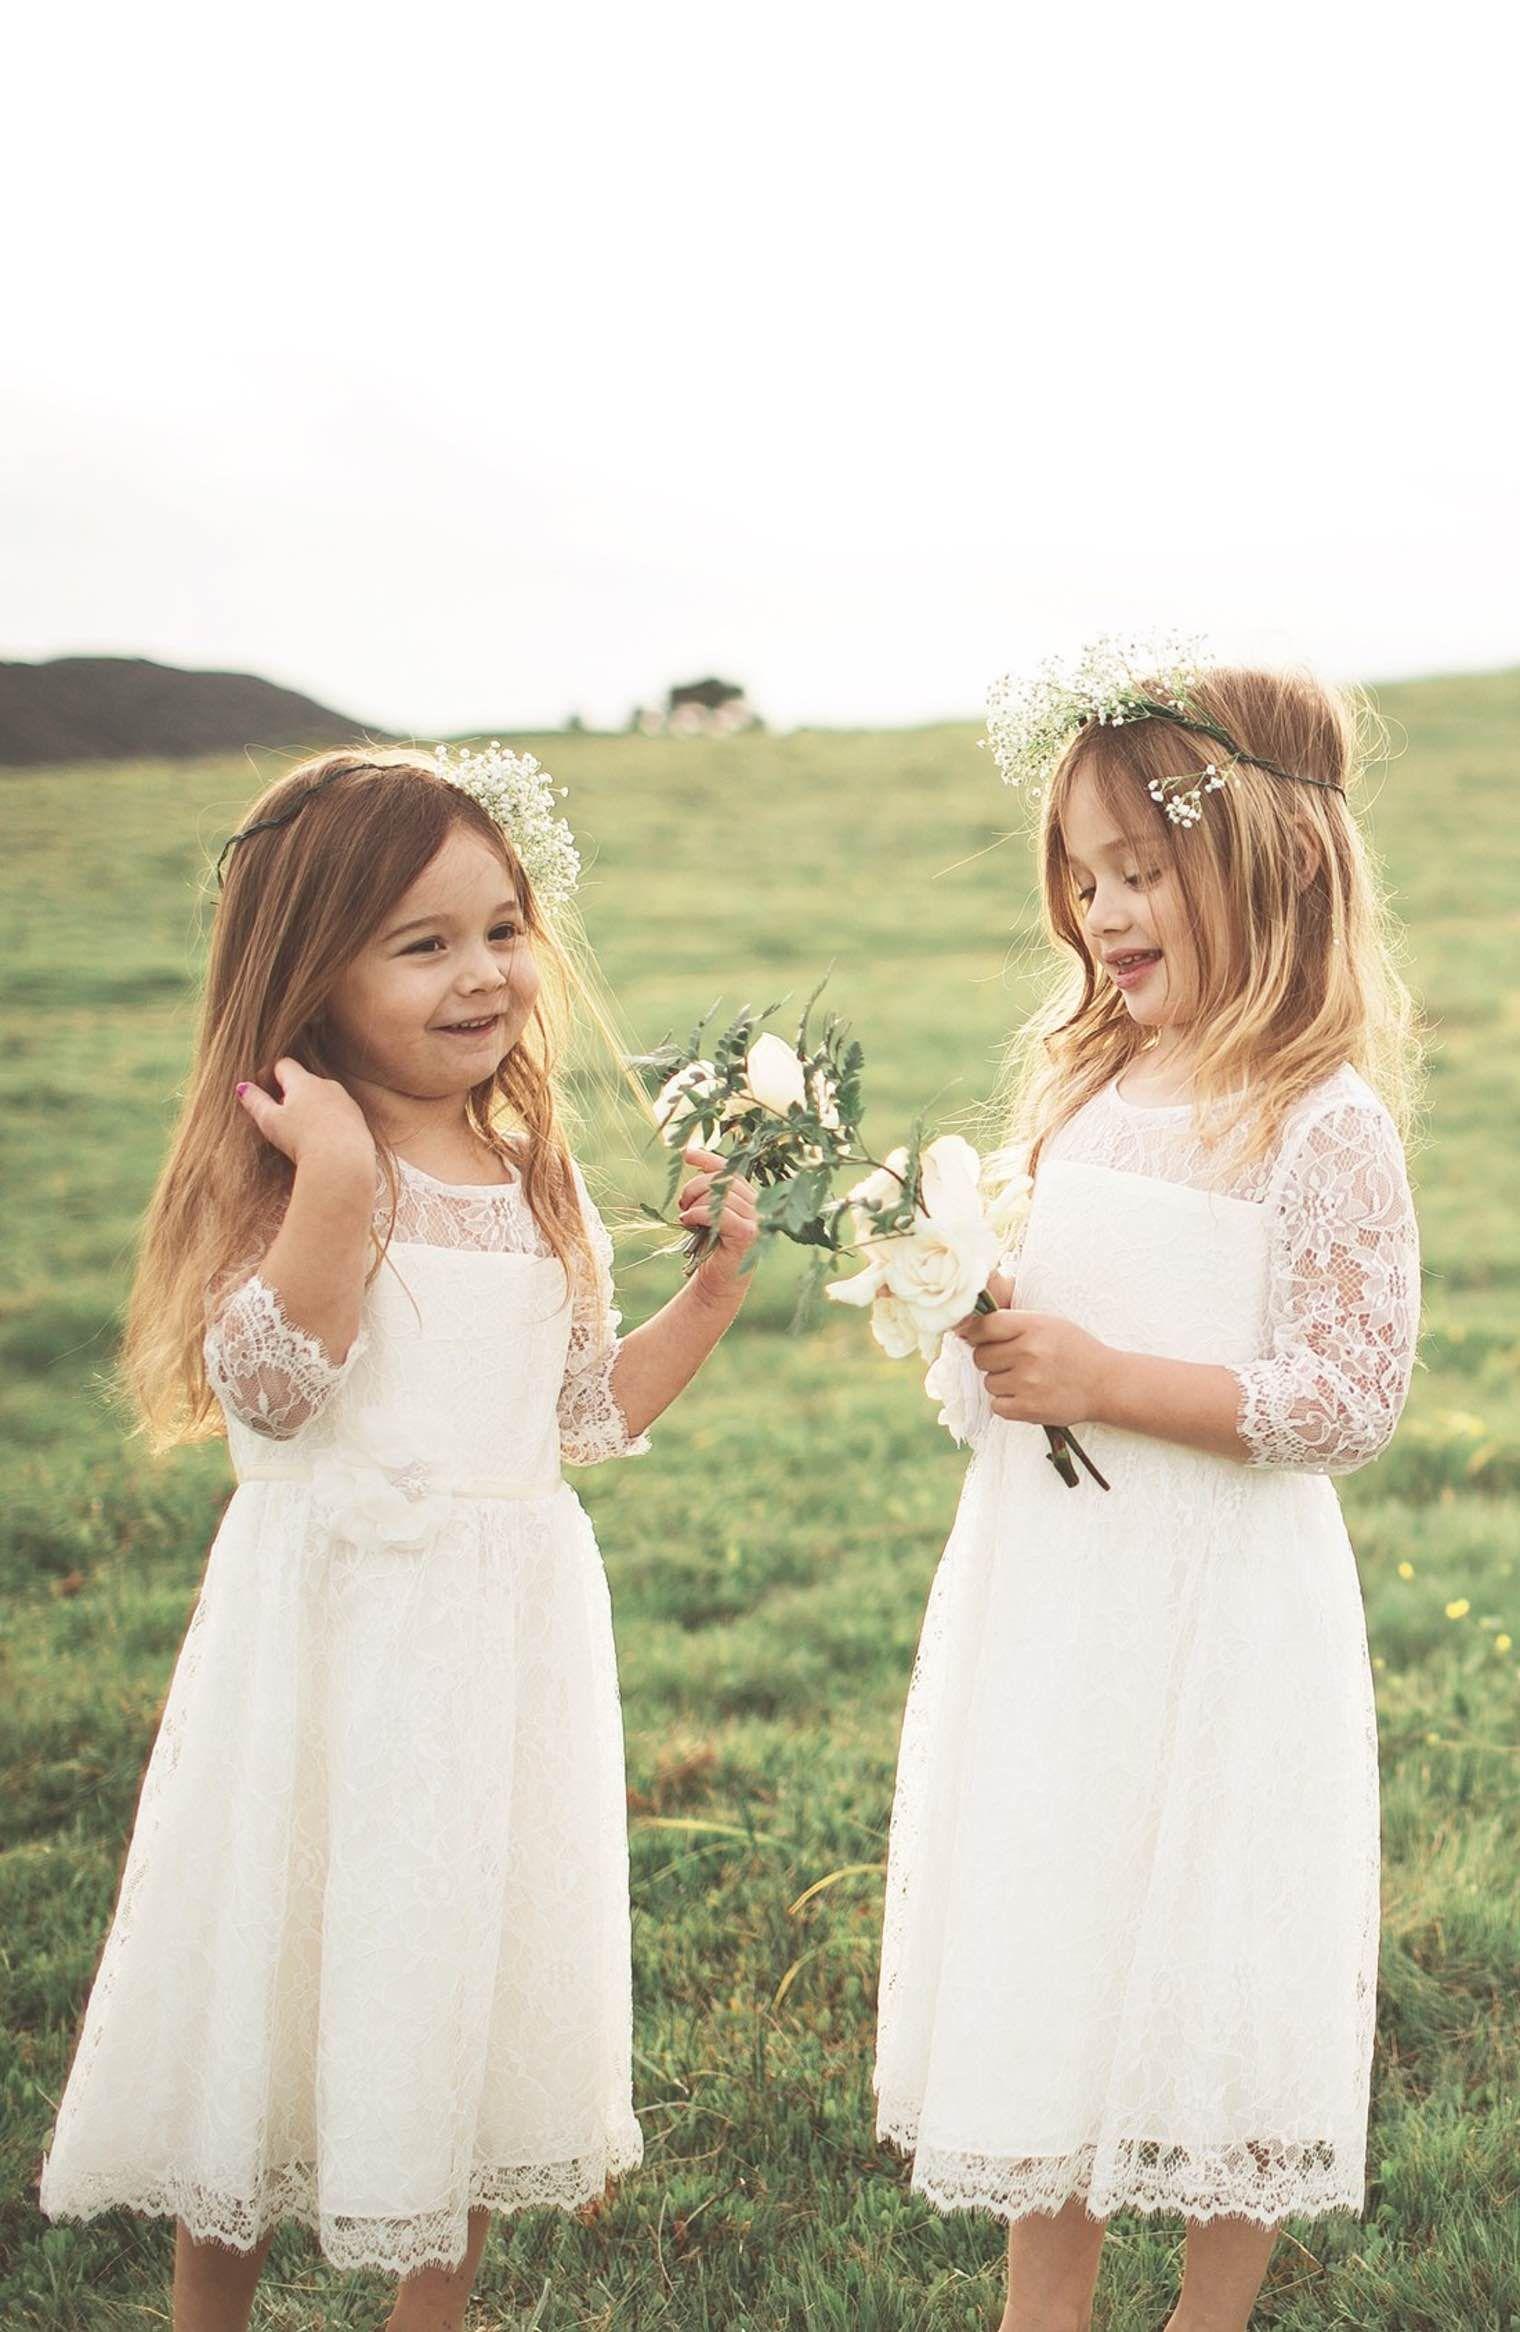 8f7fdaf25 Main Image - Jenny Yoo 'Annie' Floral Appliqué Lace Dress (Toddler, Little  Girls & Big Girls)